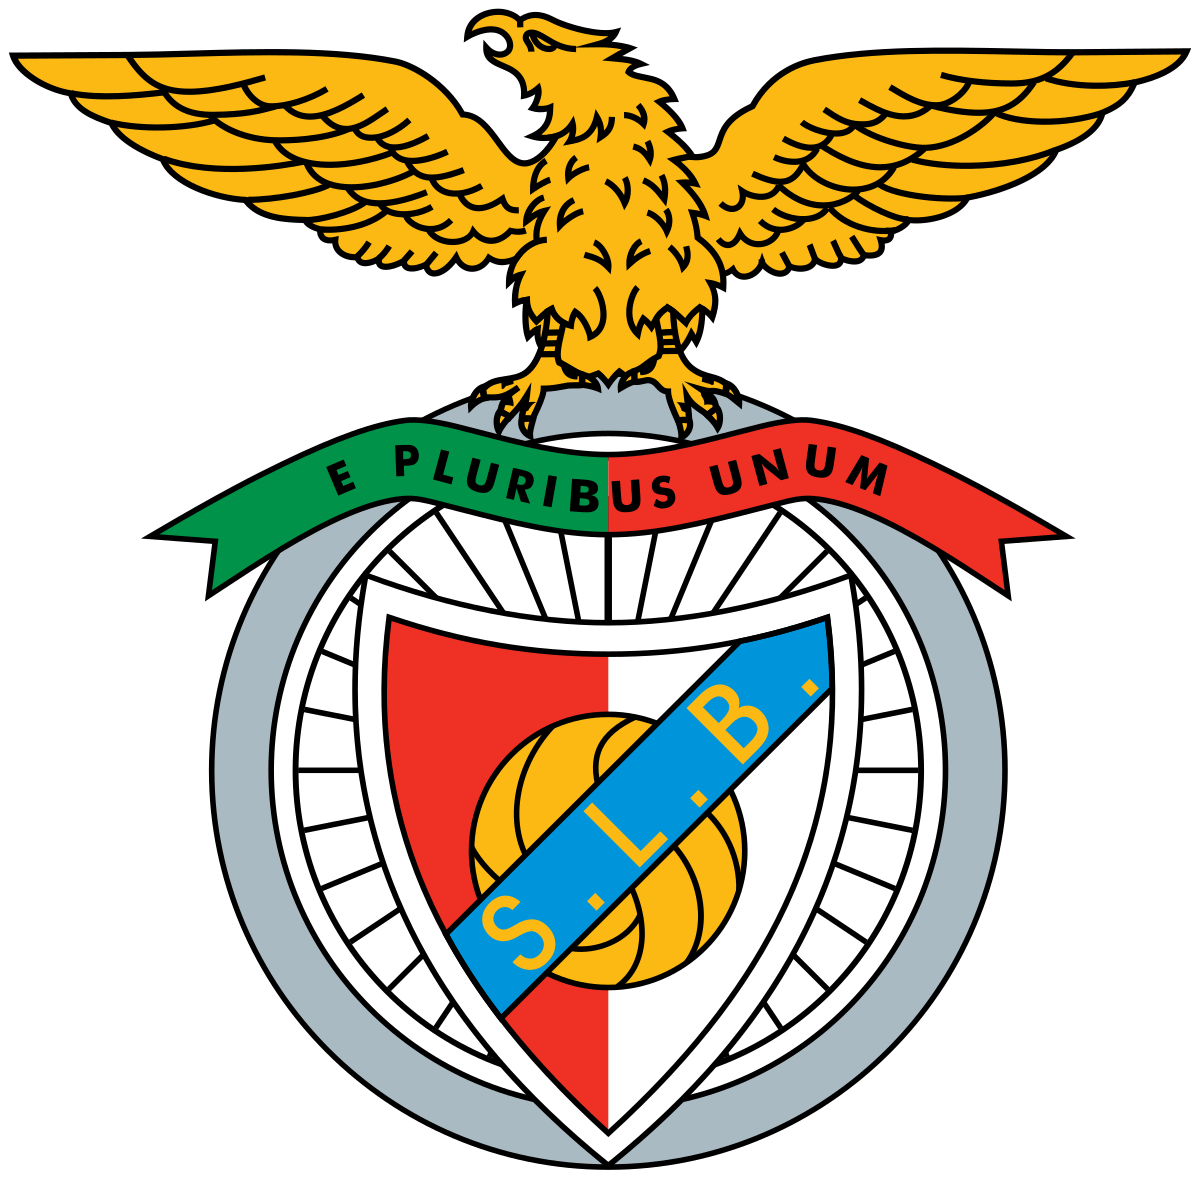 Benfica Fc Png Hdpng.com 1200 - Benfica Fc, Transparent background PNG HD thumbnail